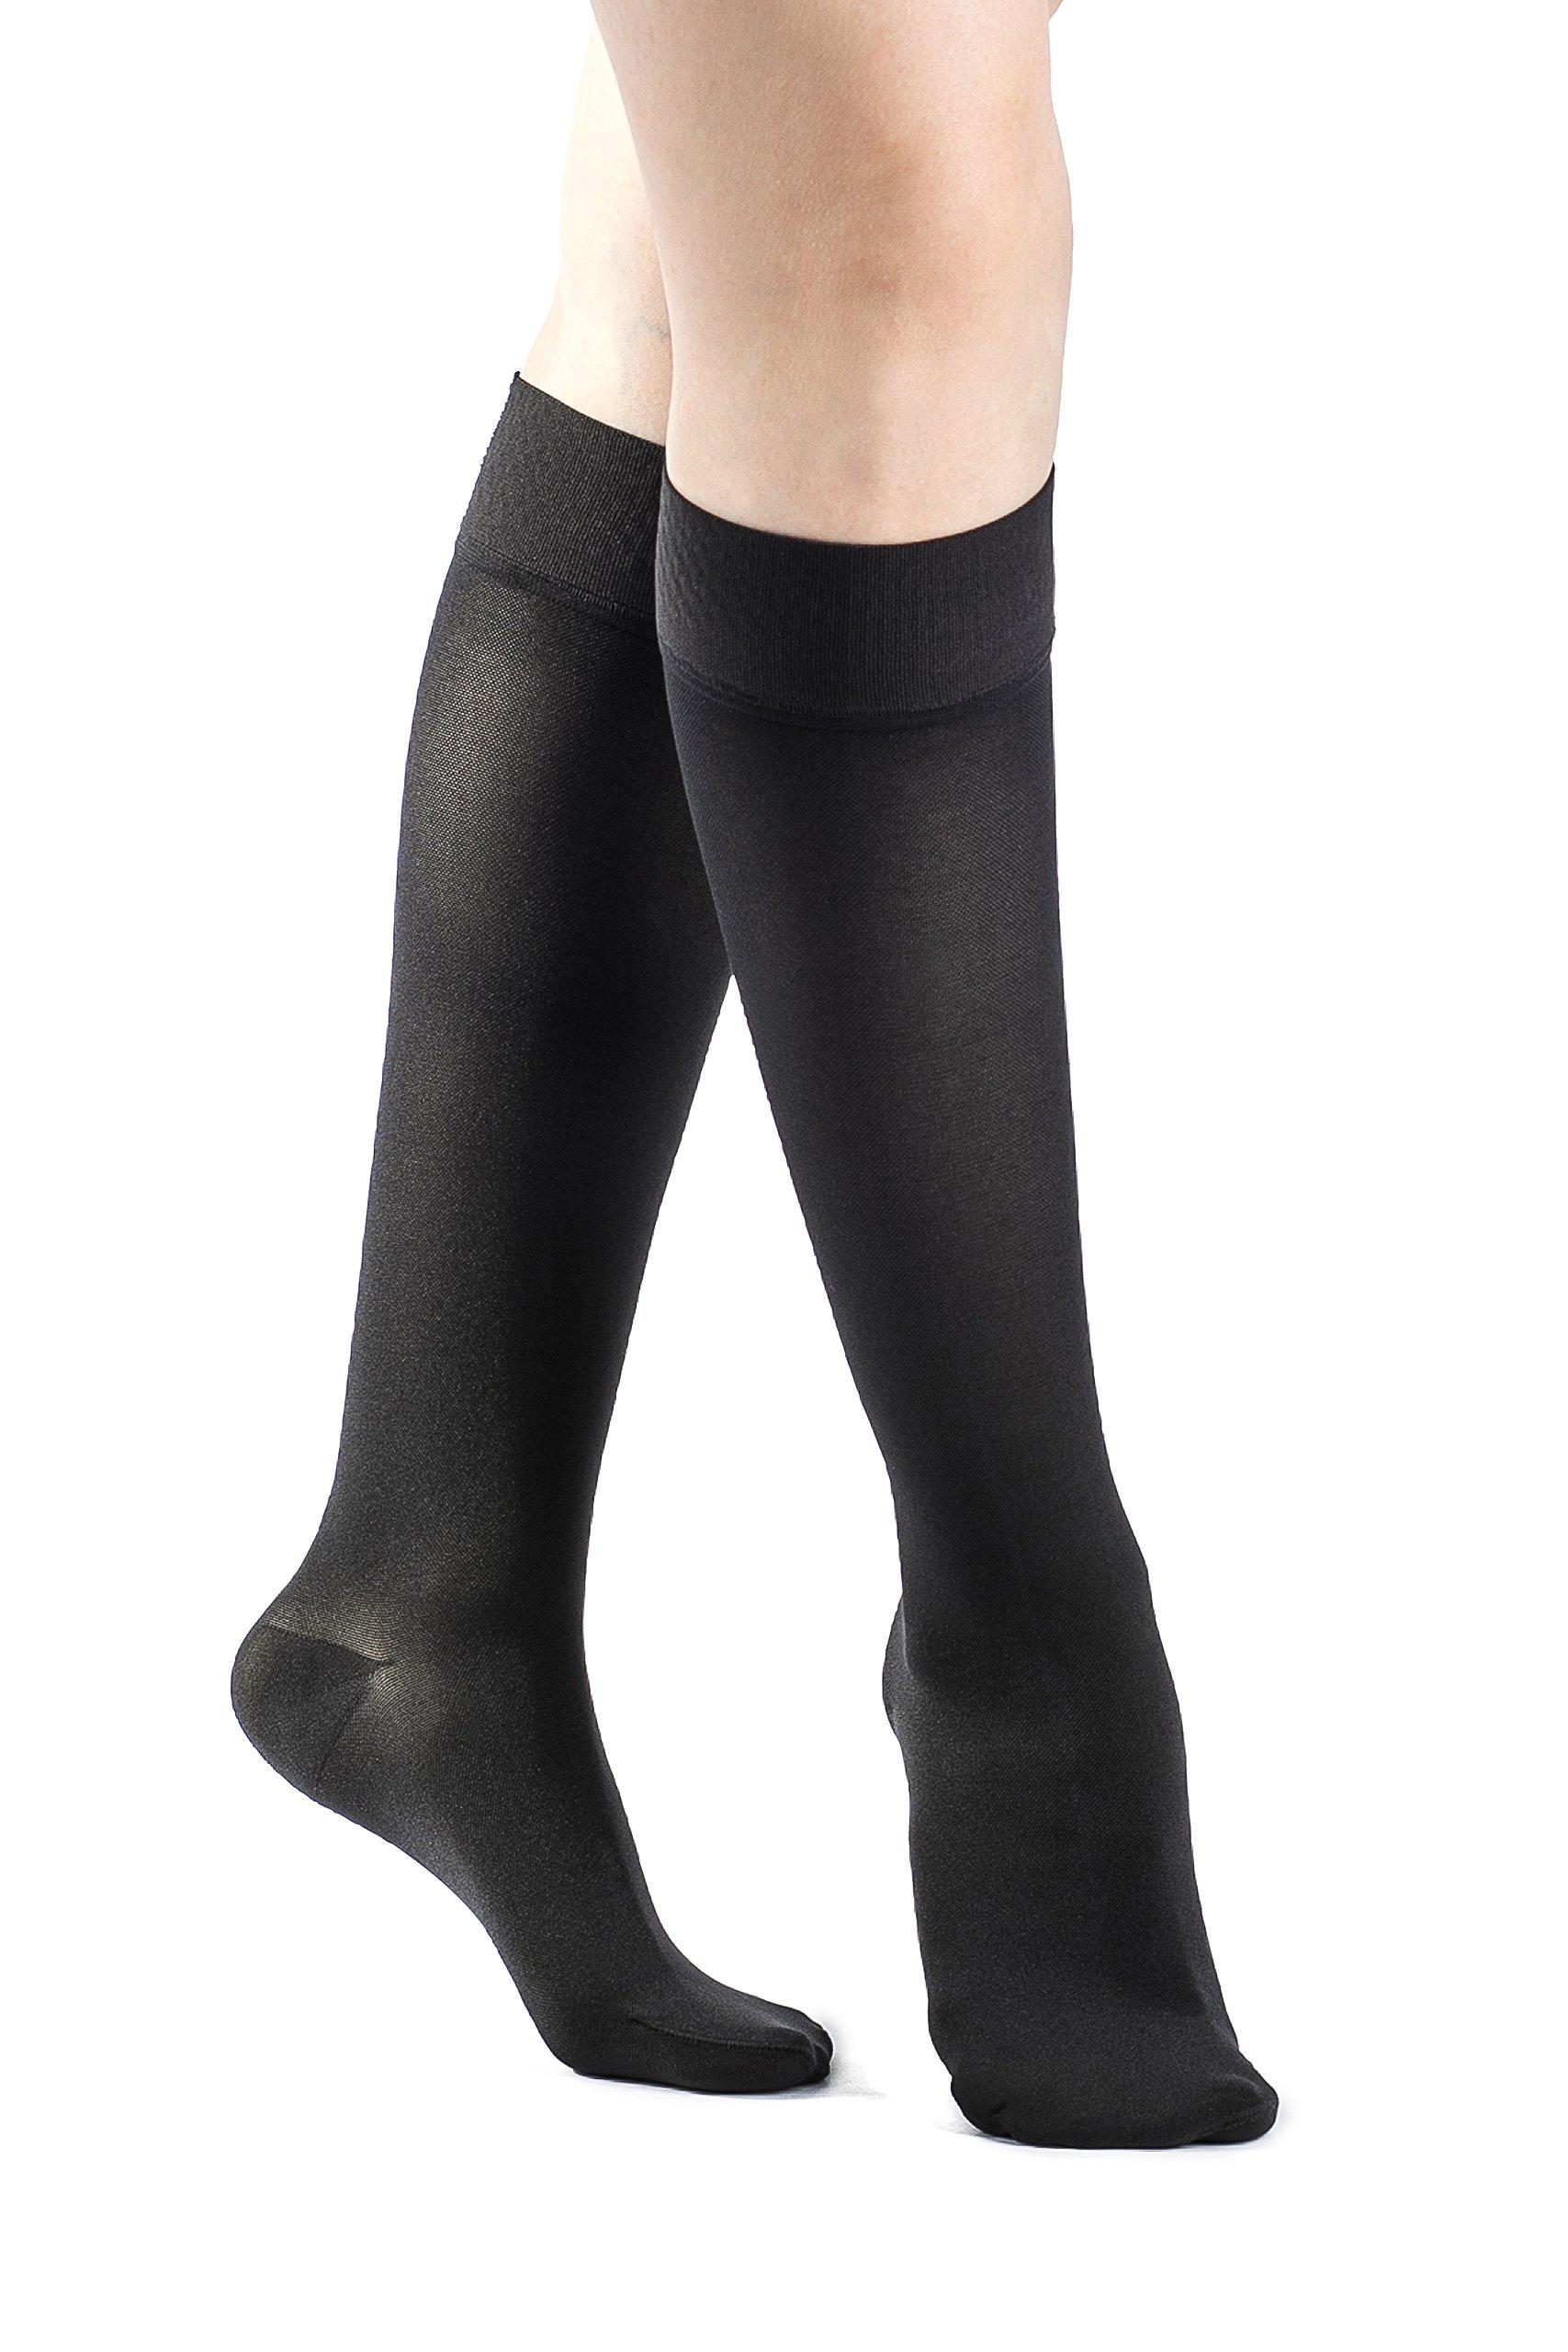 9b0d6ed74 Amazon.com  SIGVARIS Women s Select Comfort 860 Closed-Toe Calf High Hose  w Grip Top 20-30mmHg  Health   Personal Care